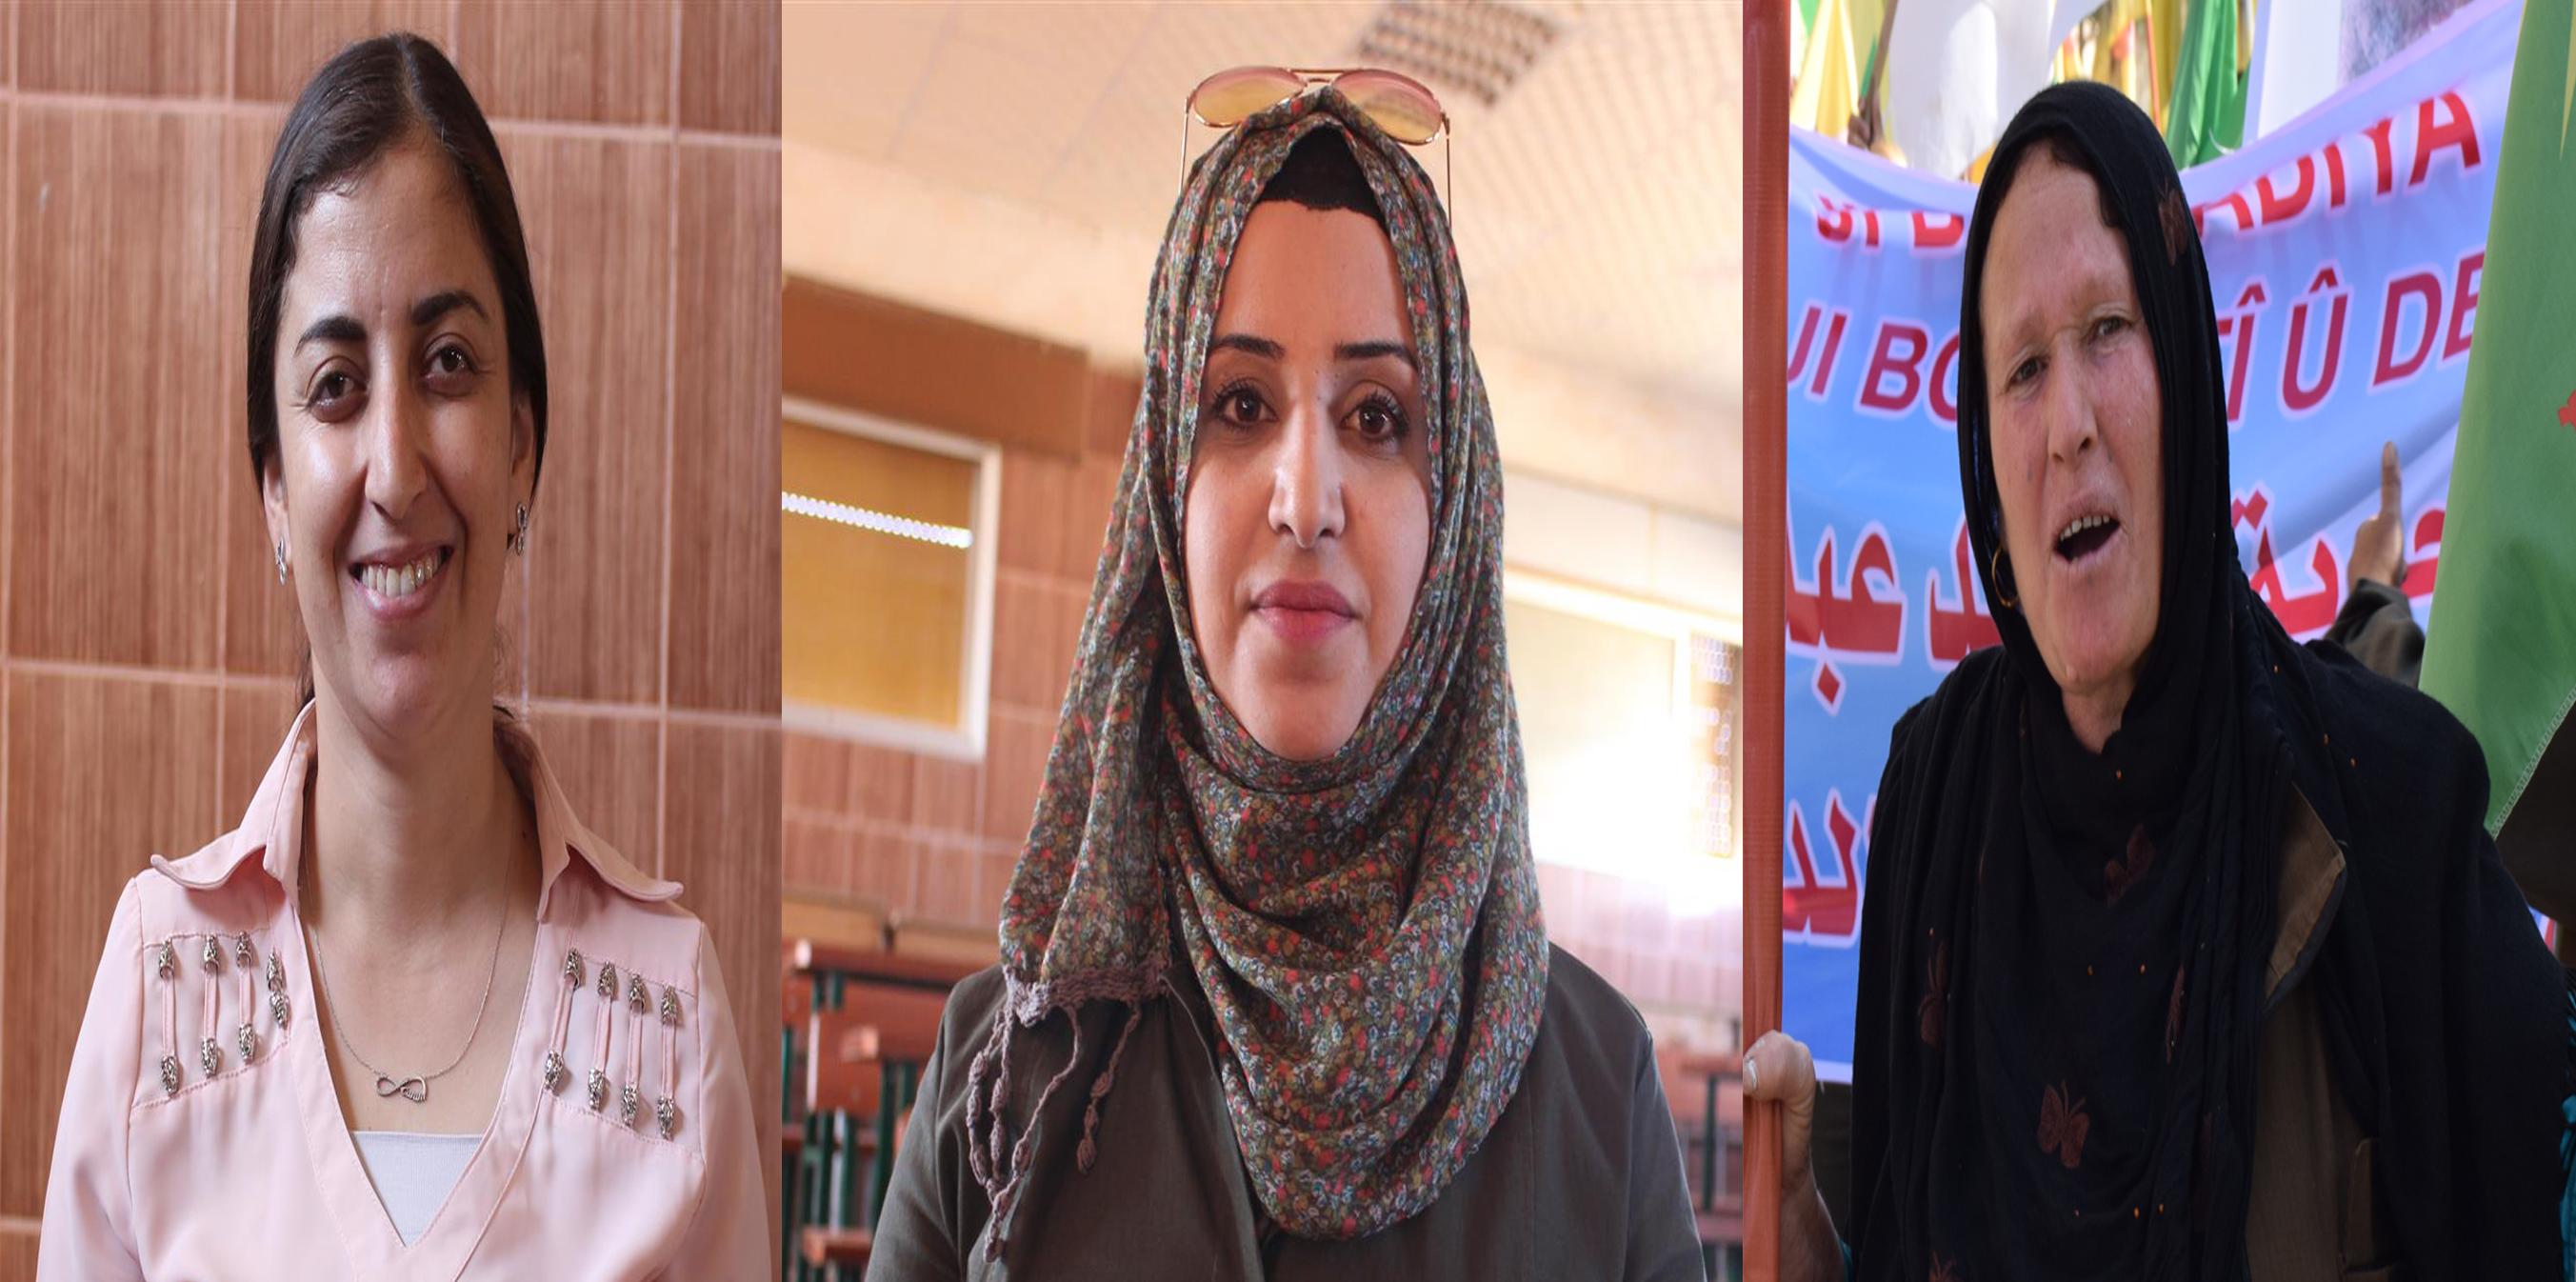 Women in al-Hasakah canton: Afrin will be liberated by Afrini women's power